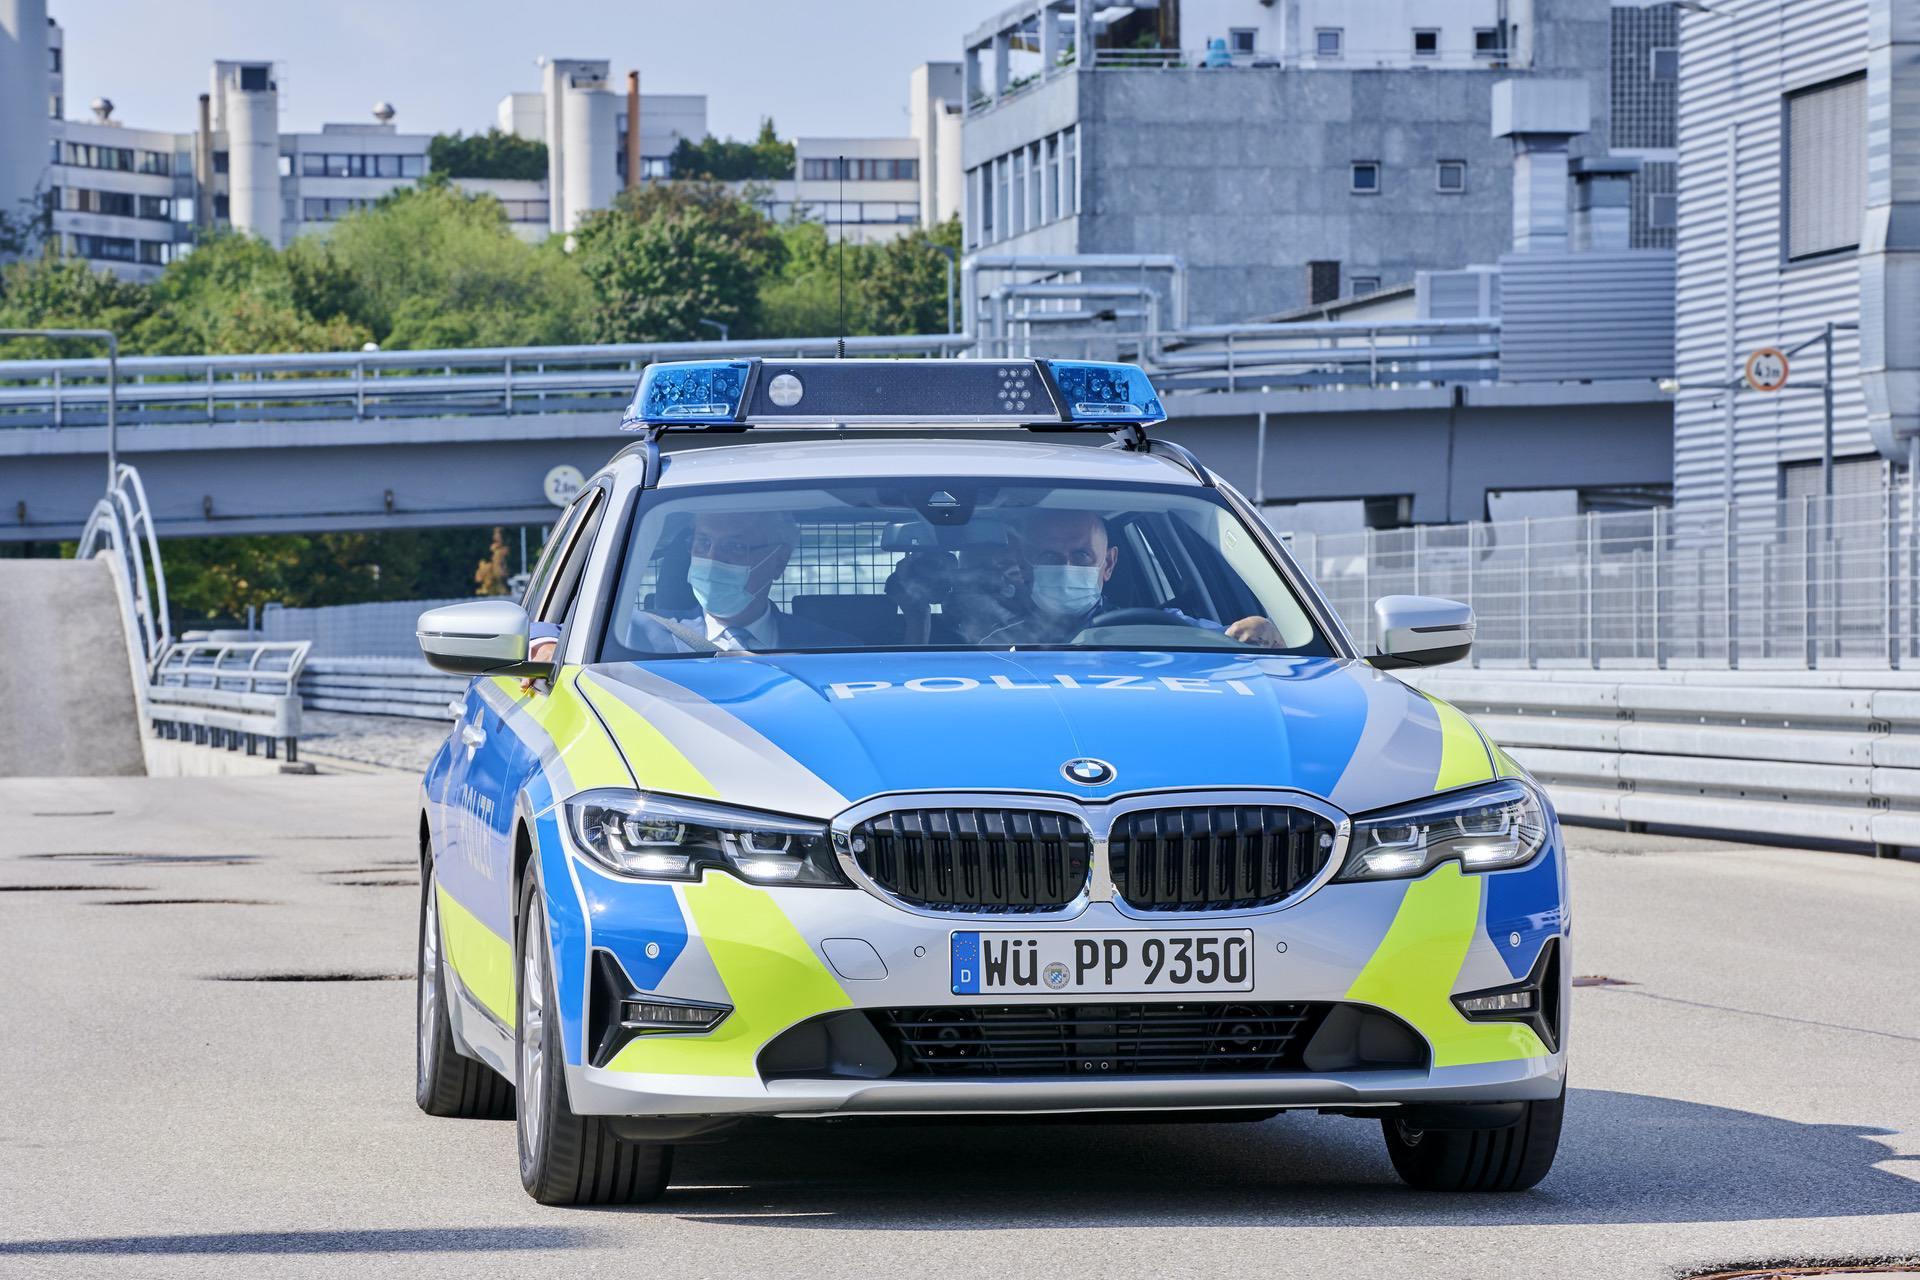 bavaria police bmw 3 series touring 04